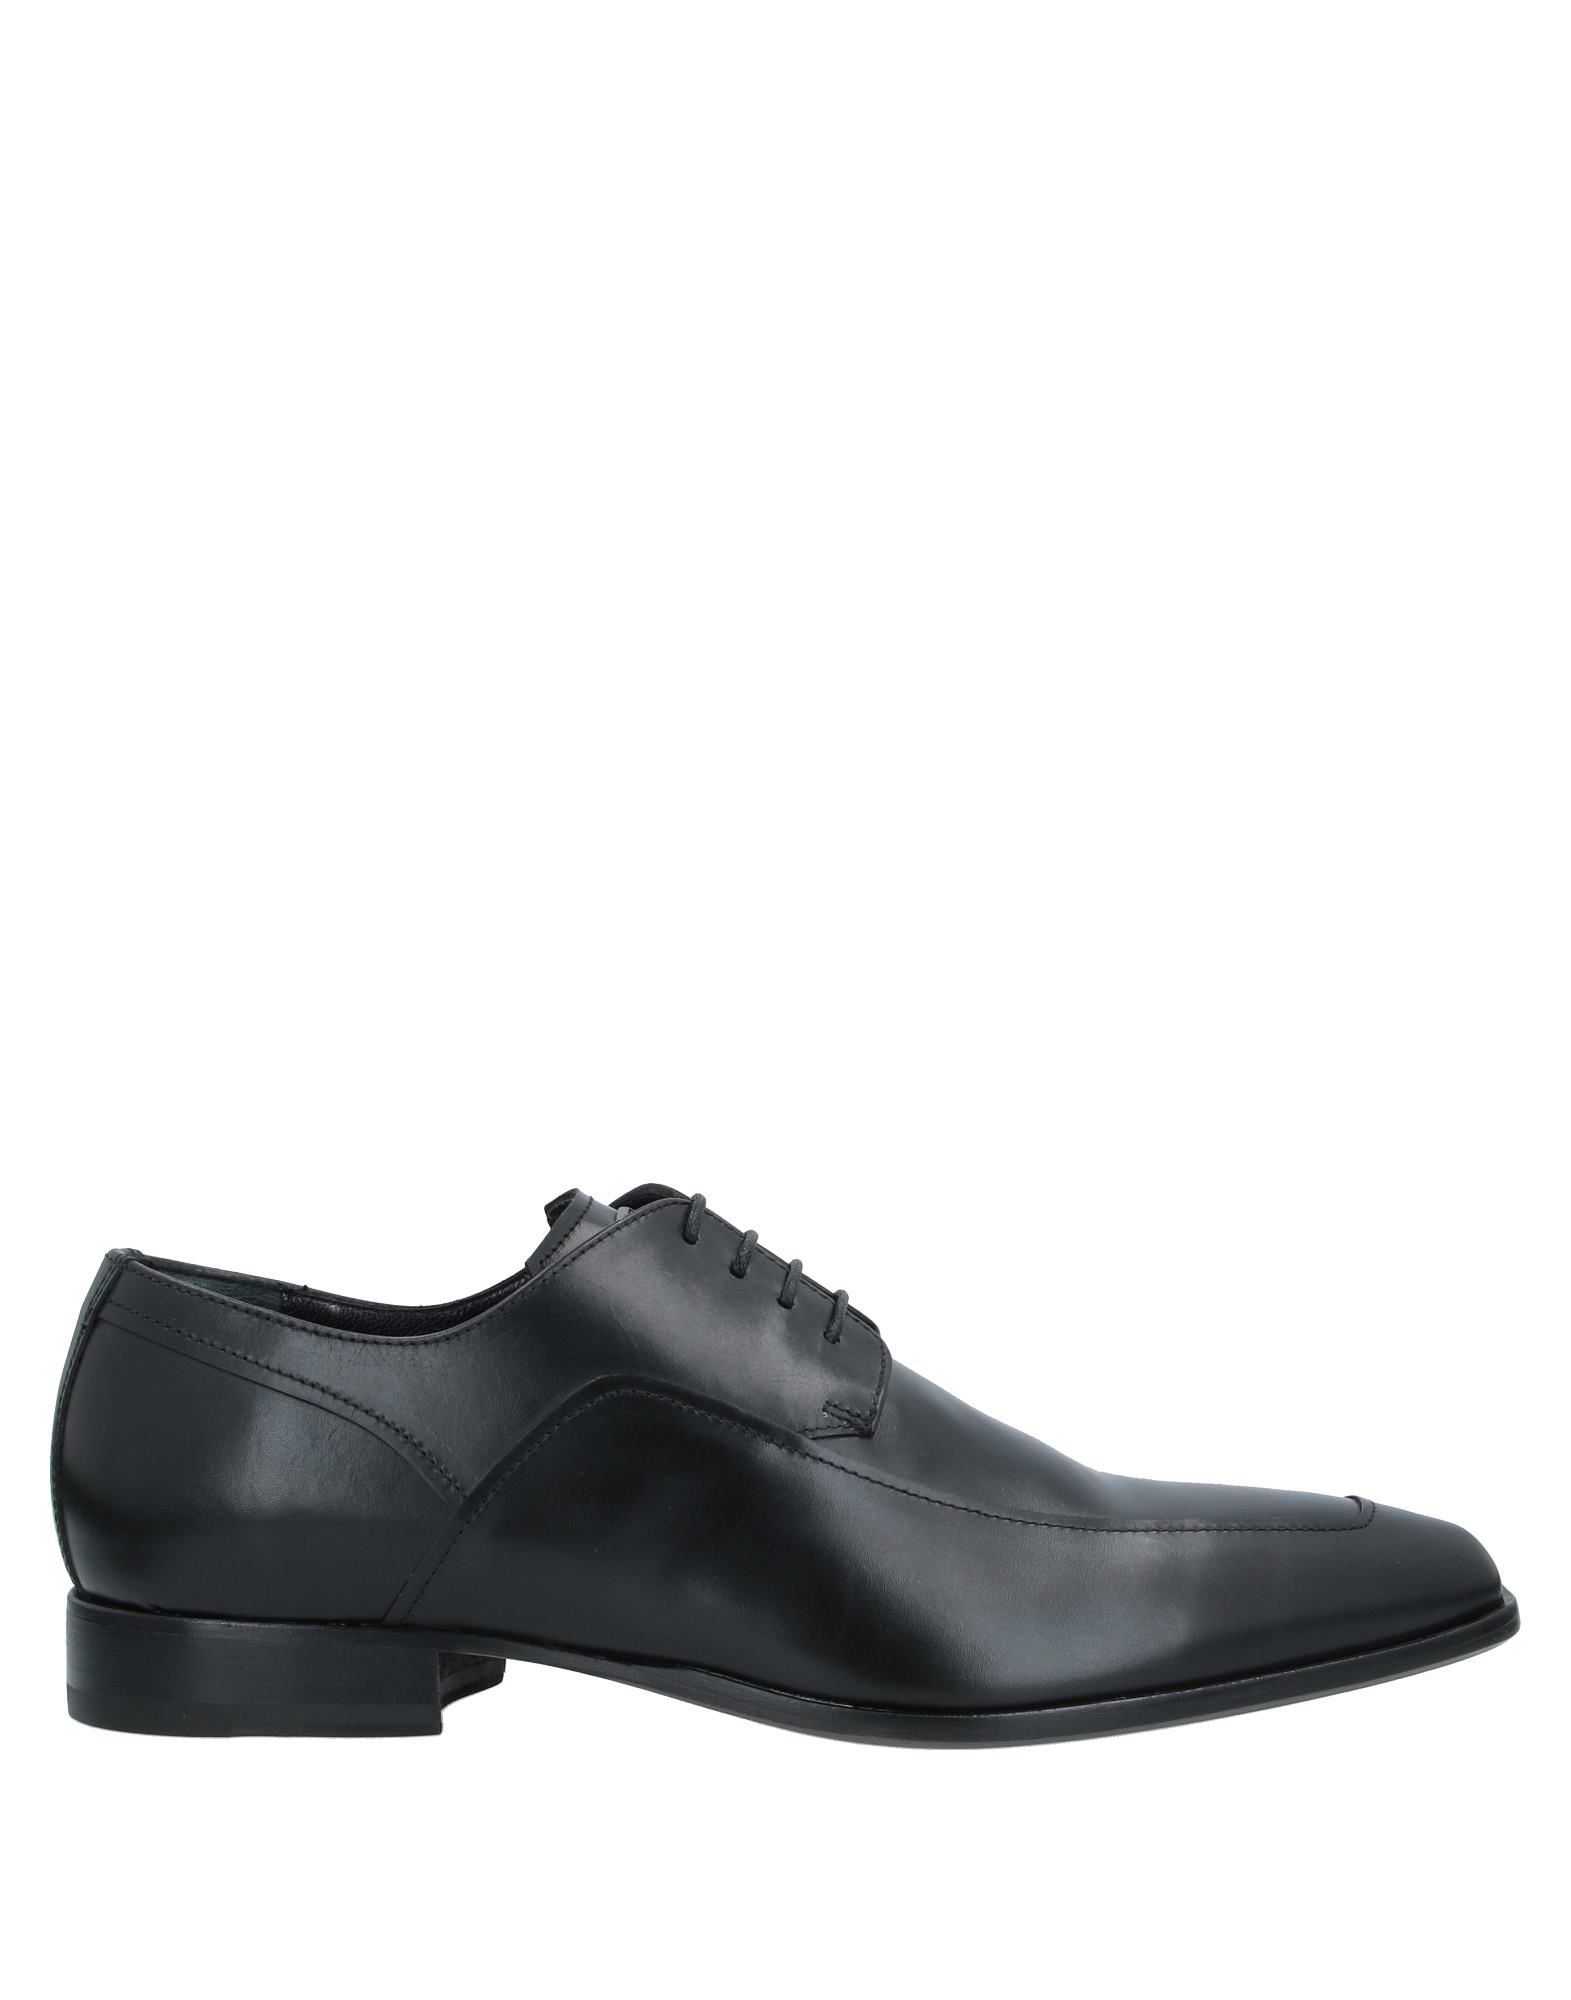 CARLO PIGNATELLI OUTSIDE Обувь на шнурках carlo pignatelli outside пиджак